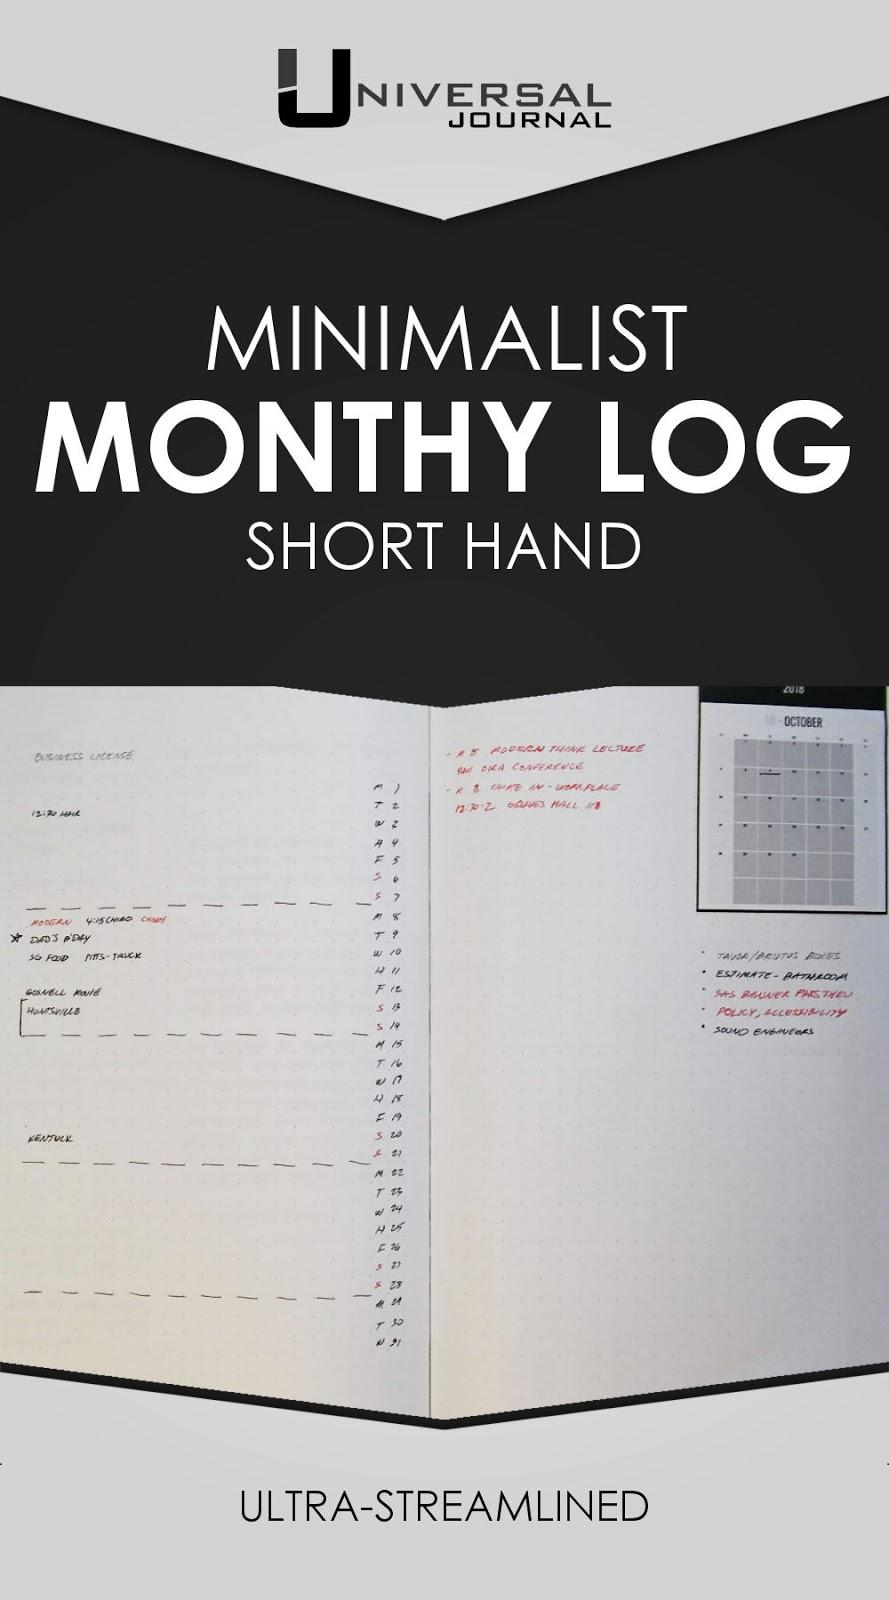 bullet journal minimalist monthly log short hand spread